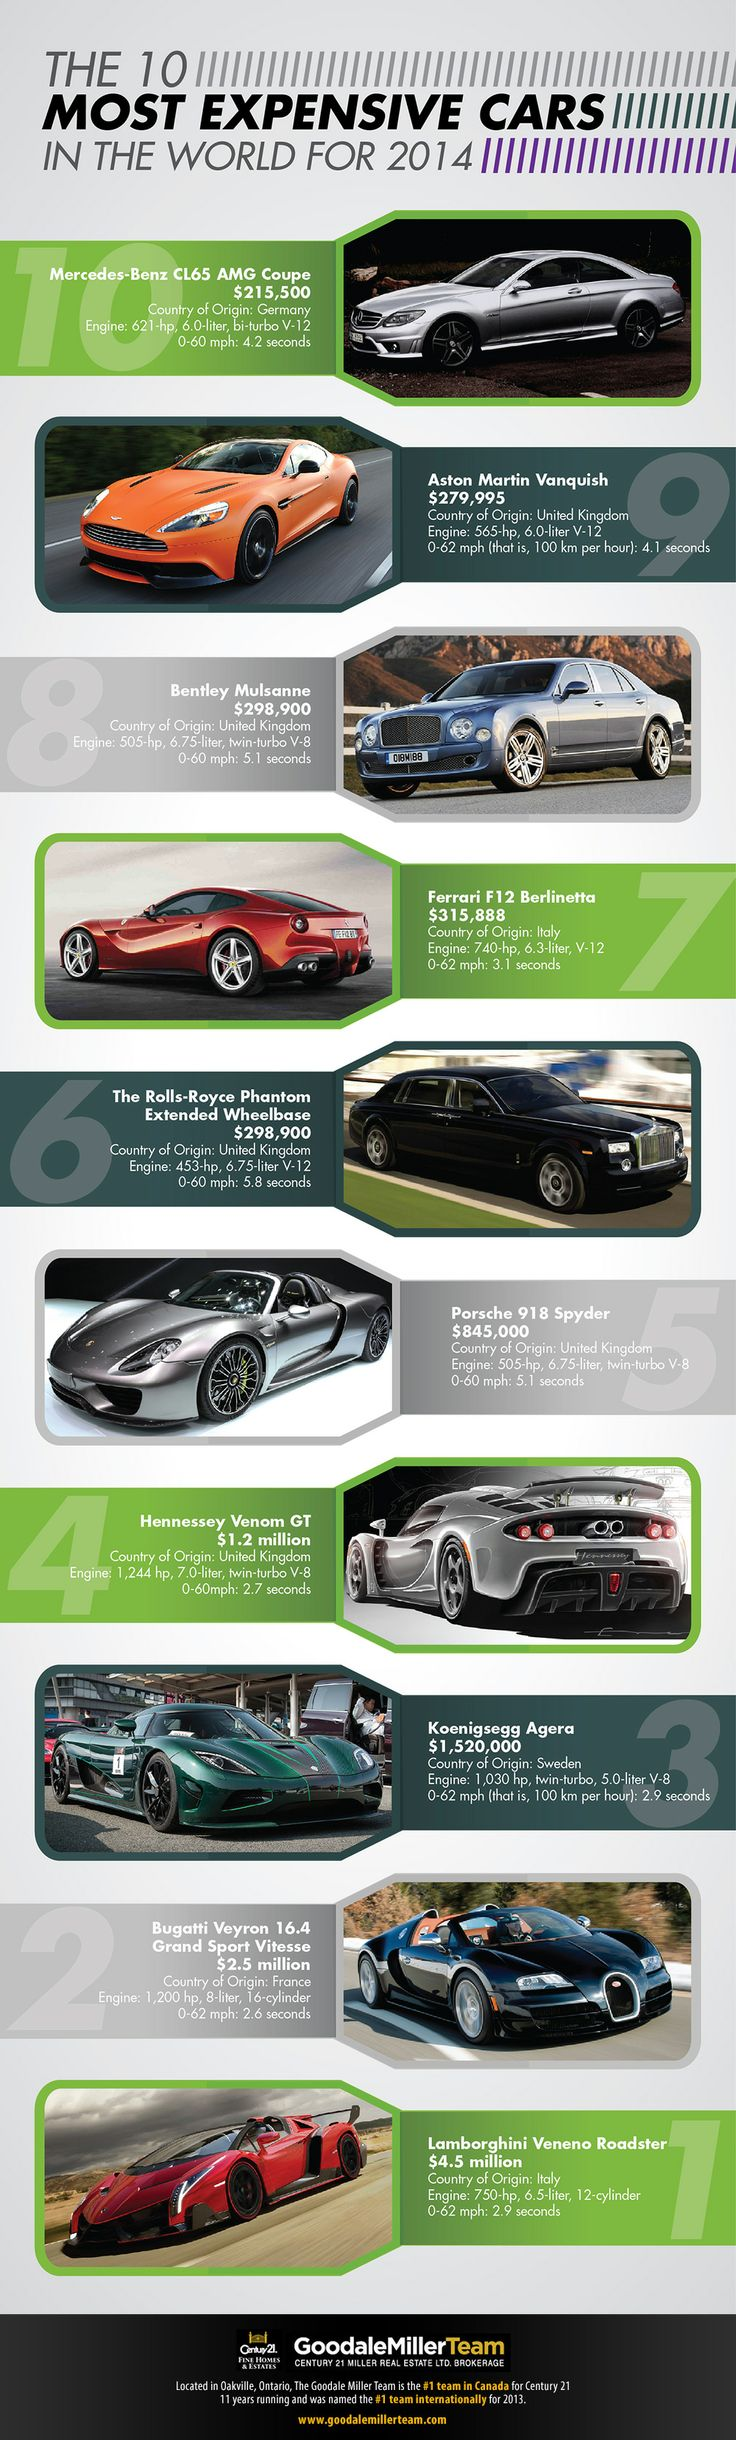 Best List Of Luxury Cars Ideas Only On Pinterest List Of